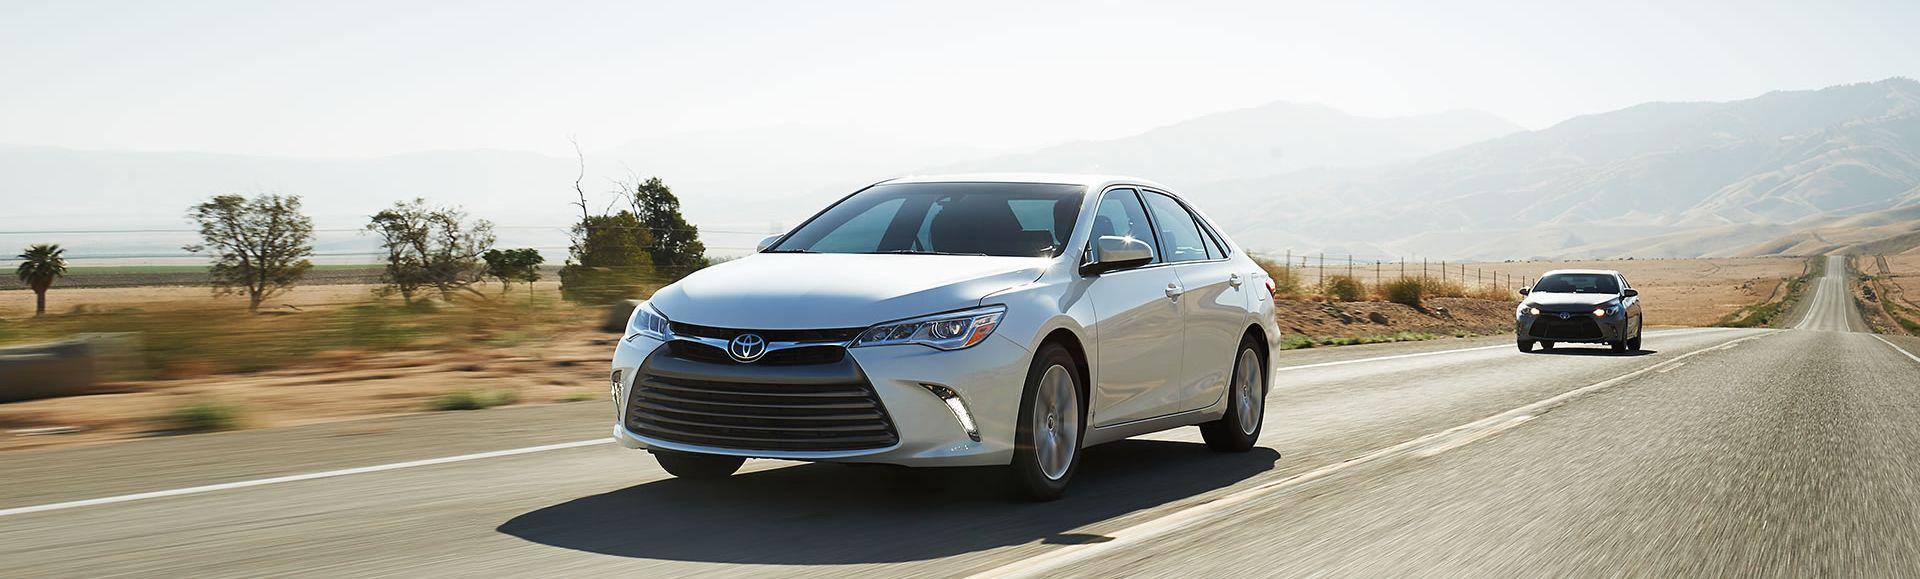 San Jose Toyota >> 2017 Toyota Camry For Sale Near San Jose Ca Fremont Toyota